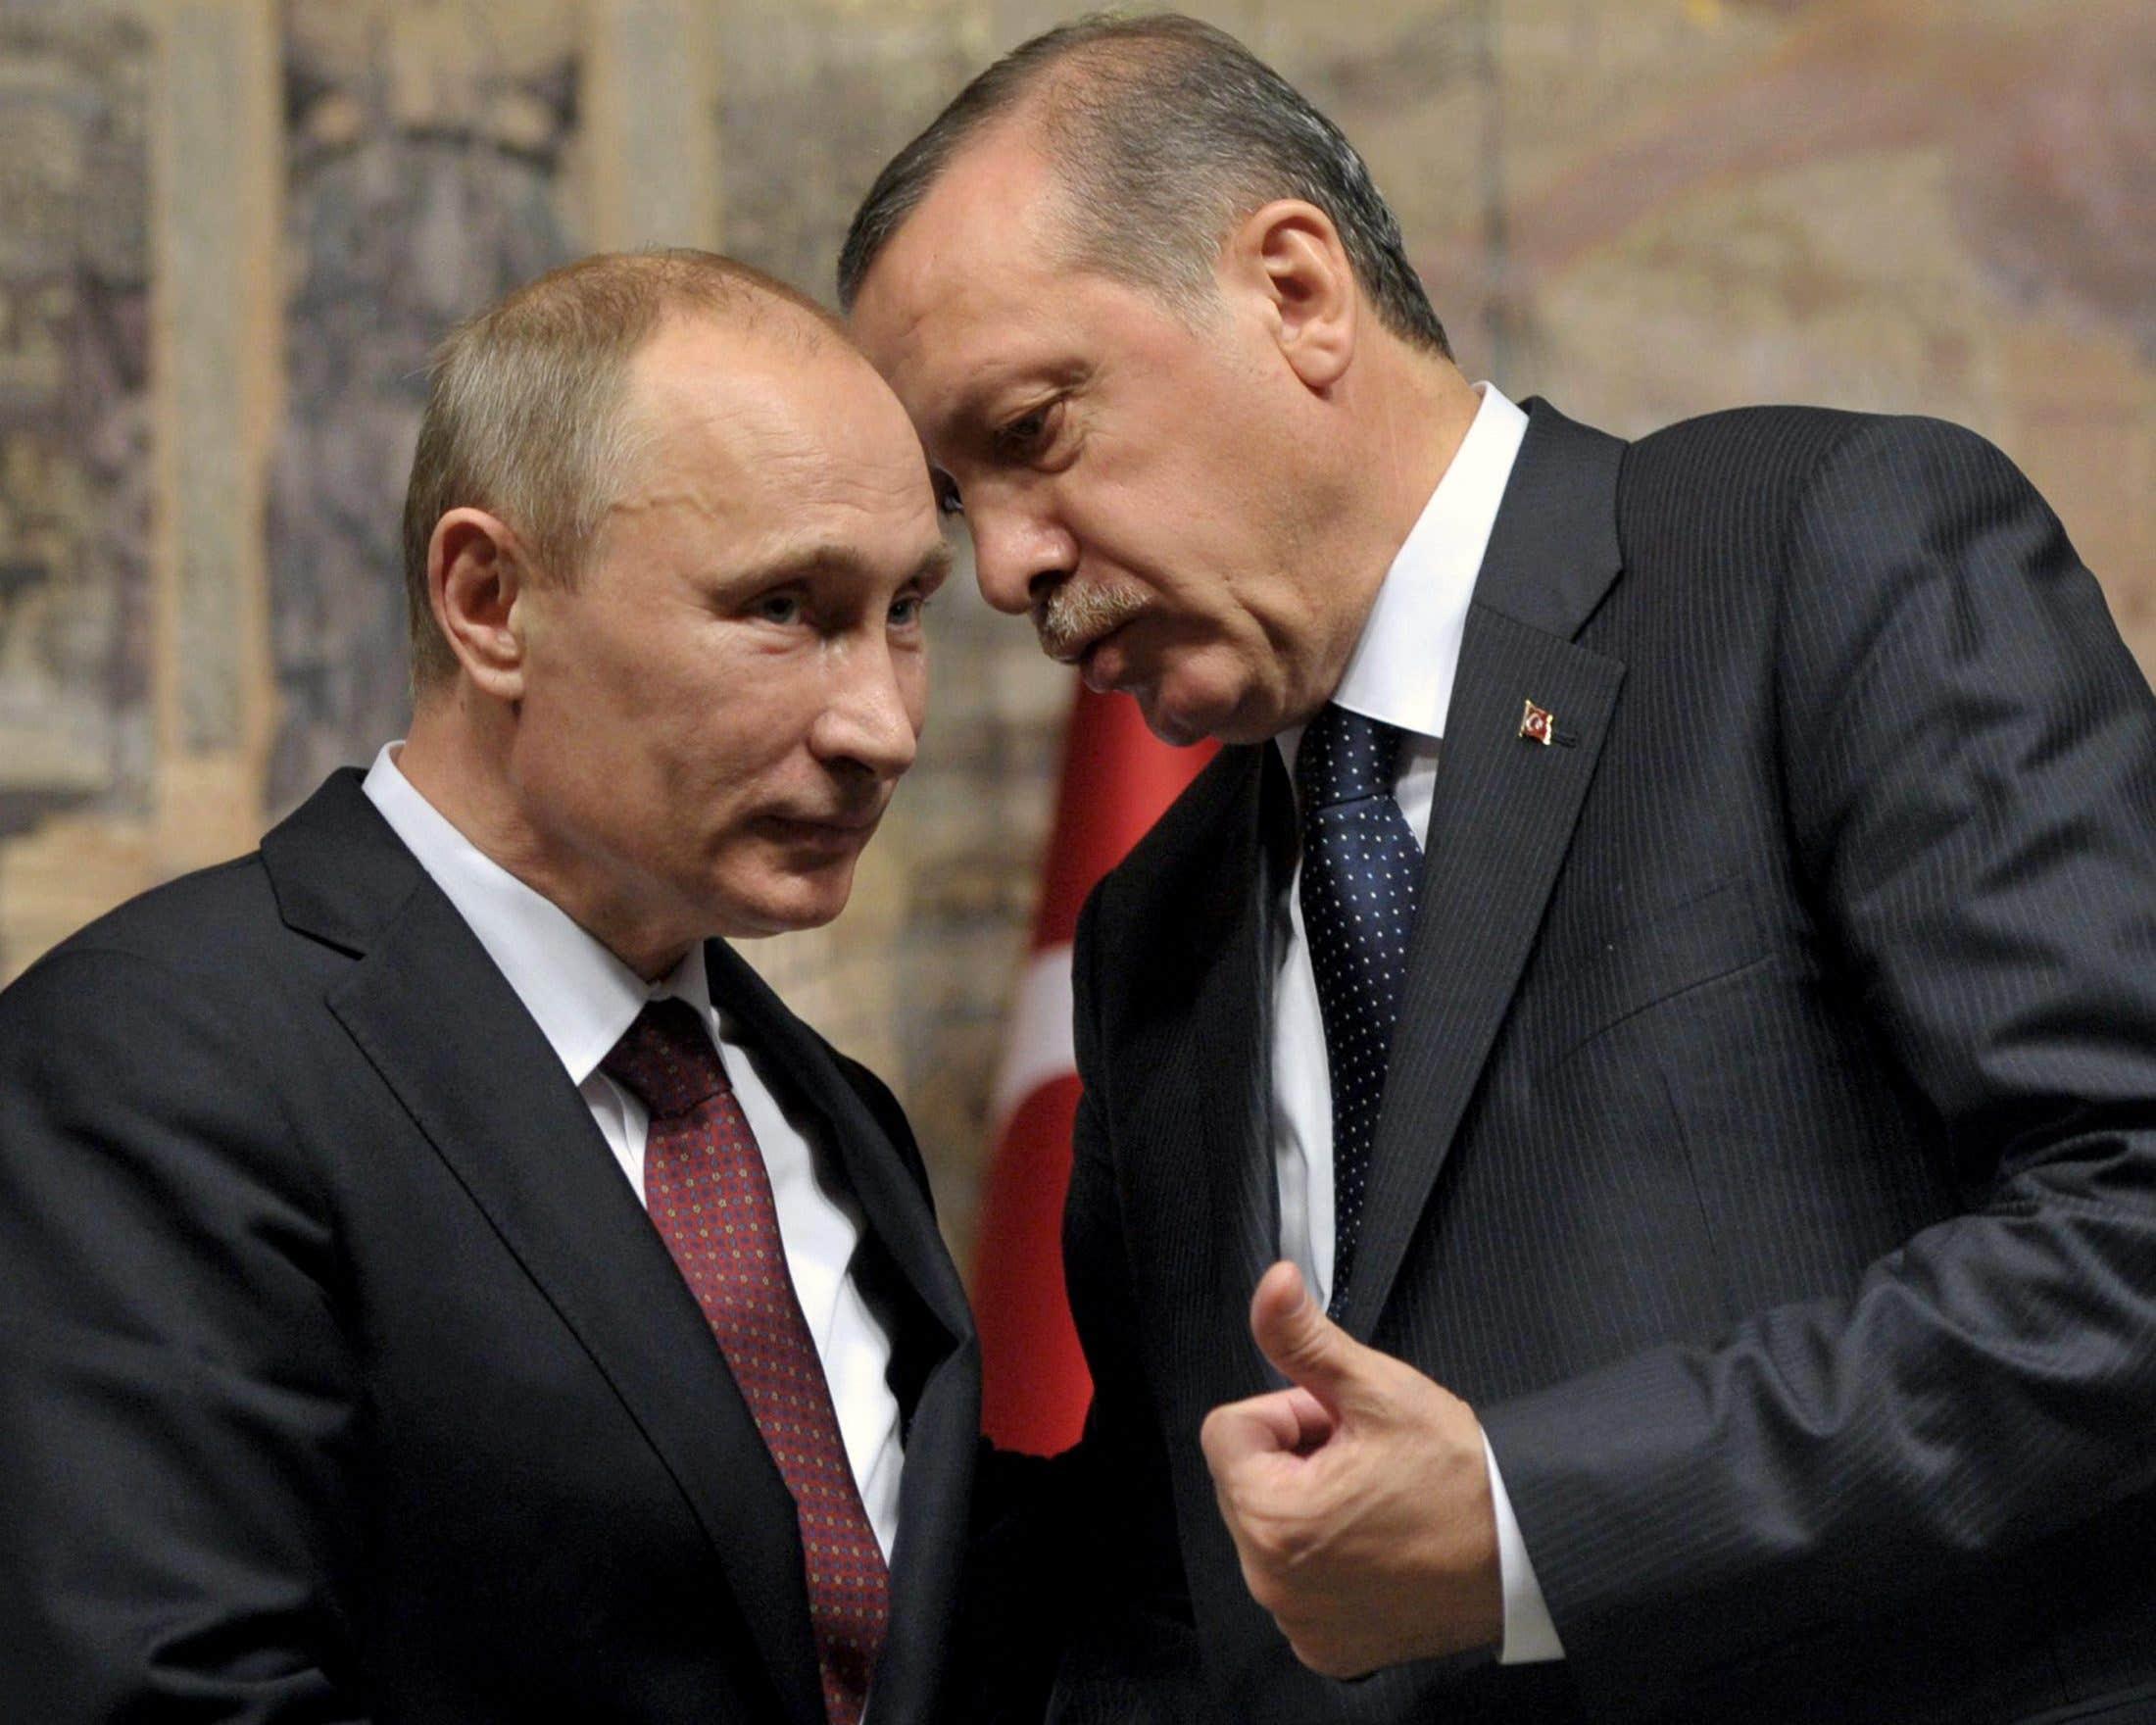 Putin and Erdogan discussed settlement in Karabakh